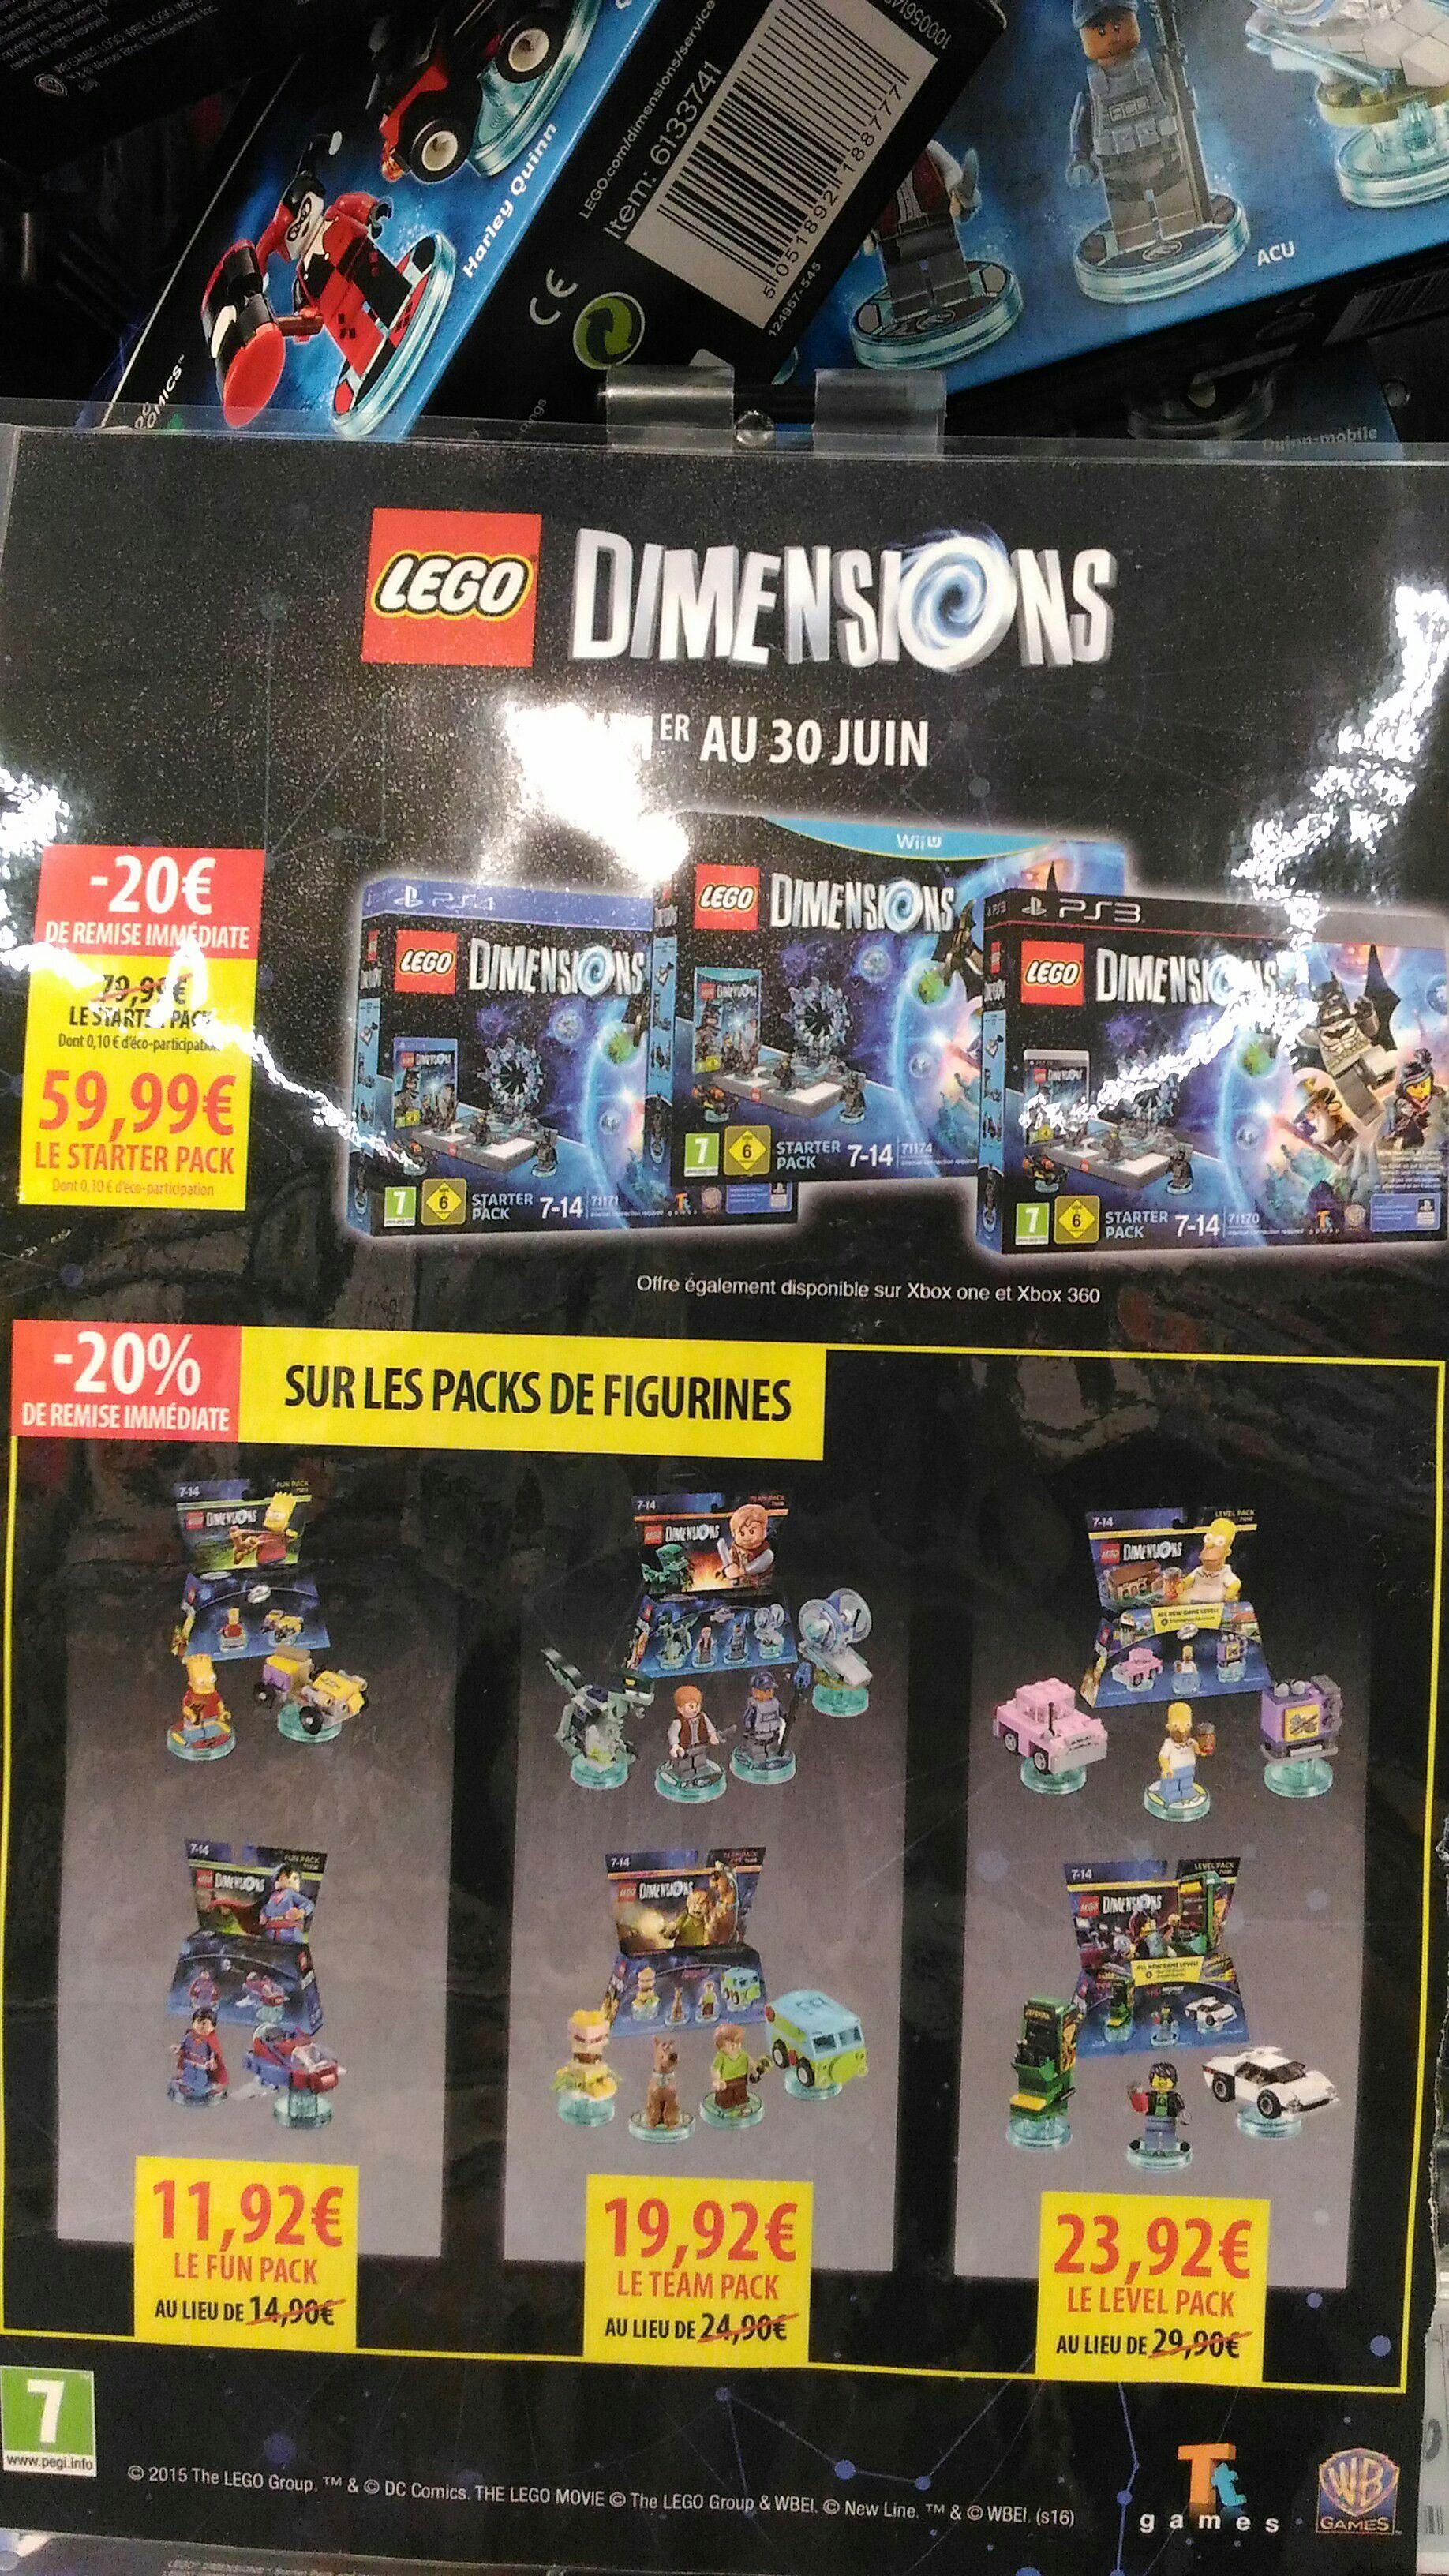 Starter Pack Lego Dimensions sur PS4, PS3 ou Wii U